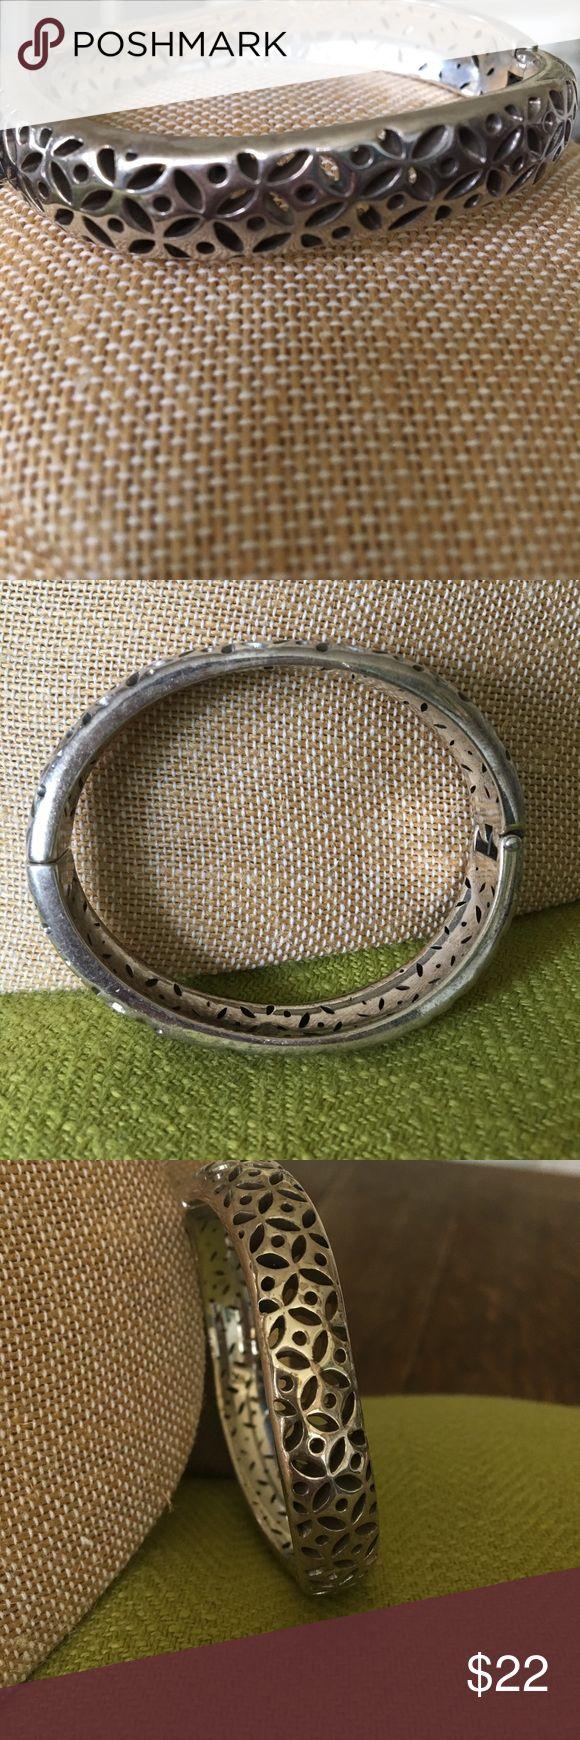 Brighton Bracelet Silver oval Brighton Bracelet. Magnetic closure. Cut out design. Some tarnishing but very pretty still. Brighton Jewelry Bracelets